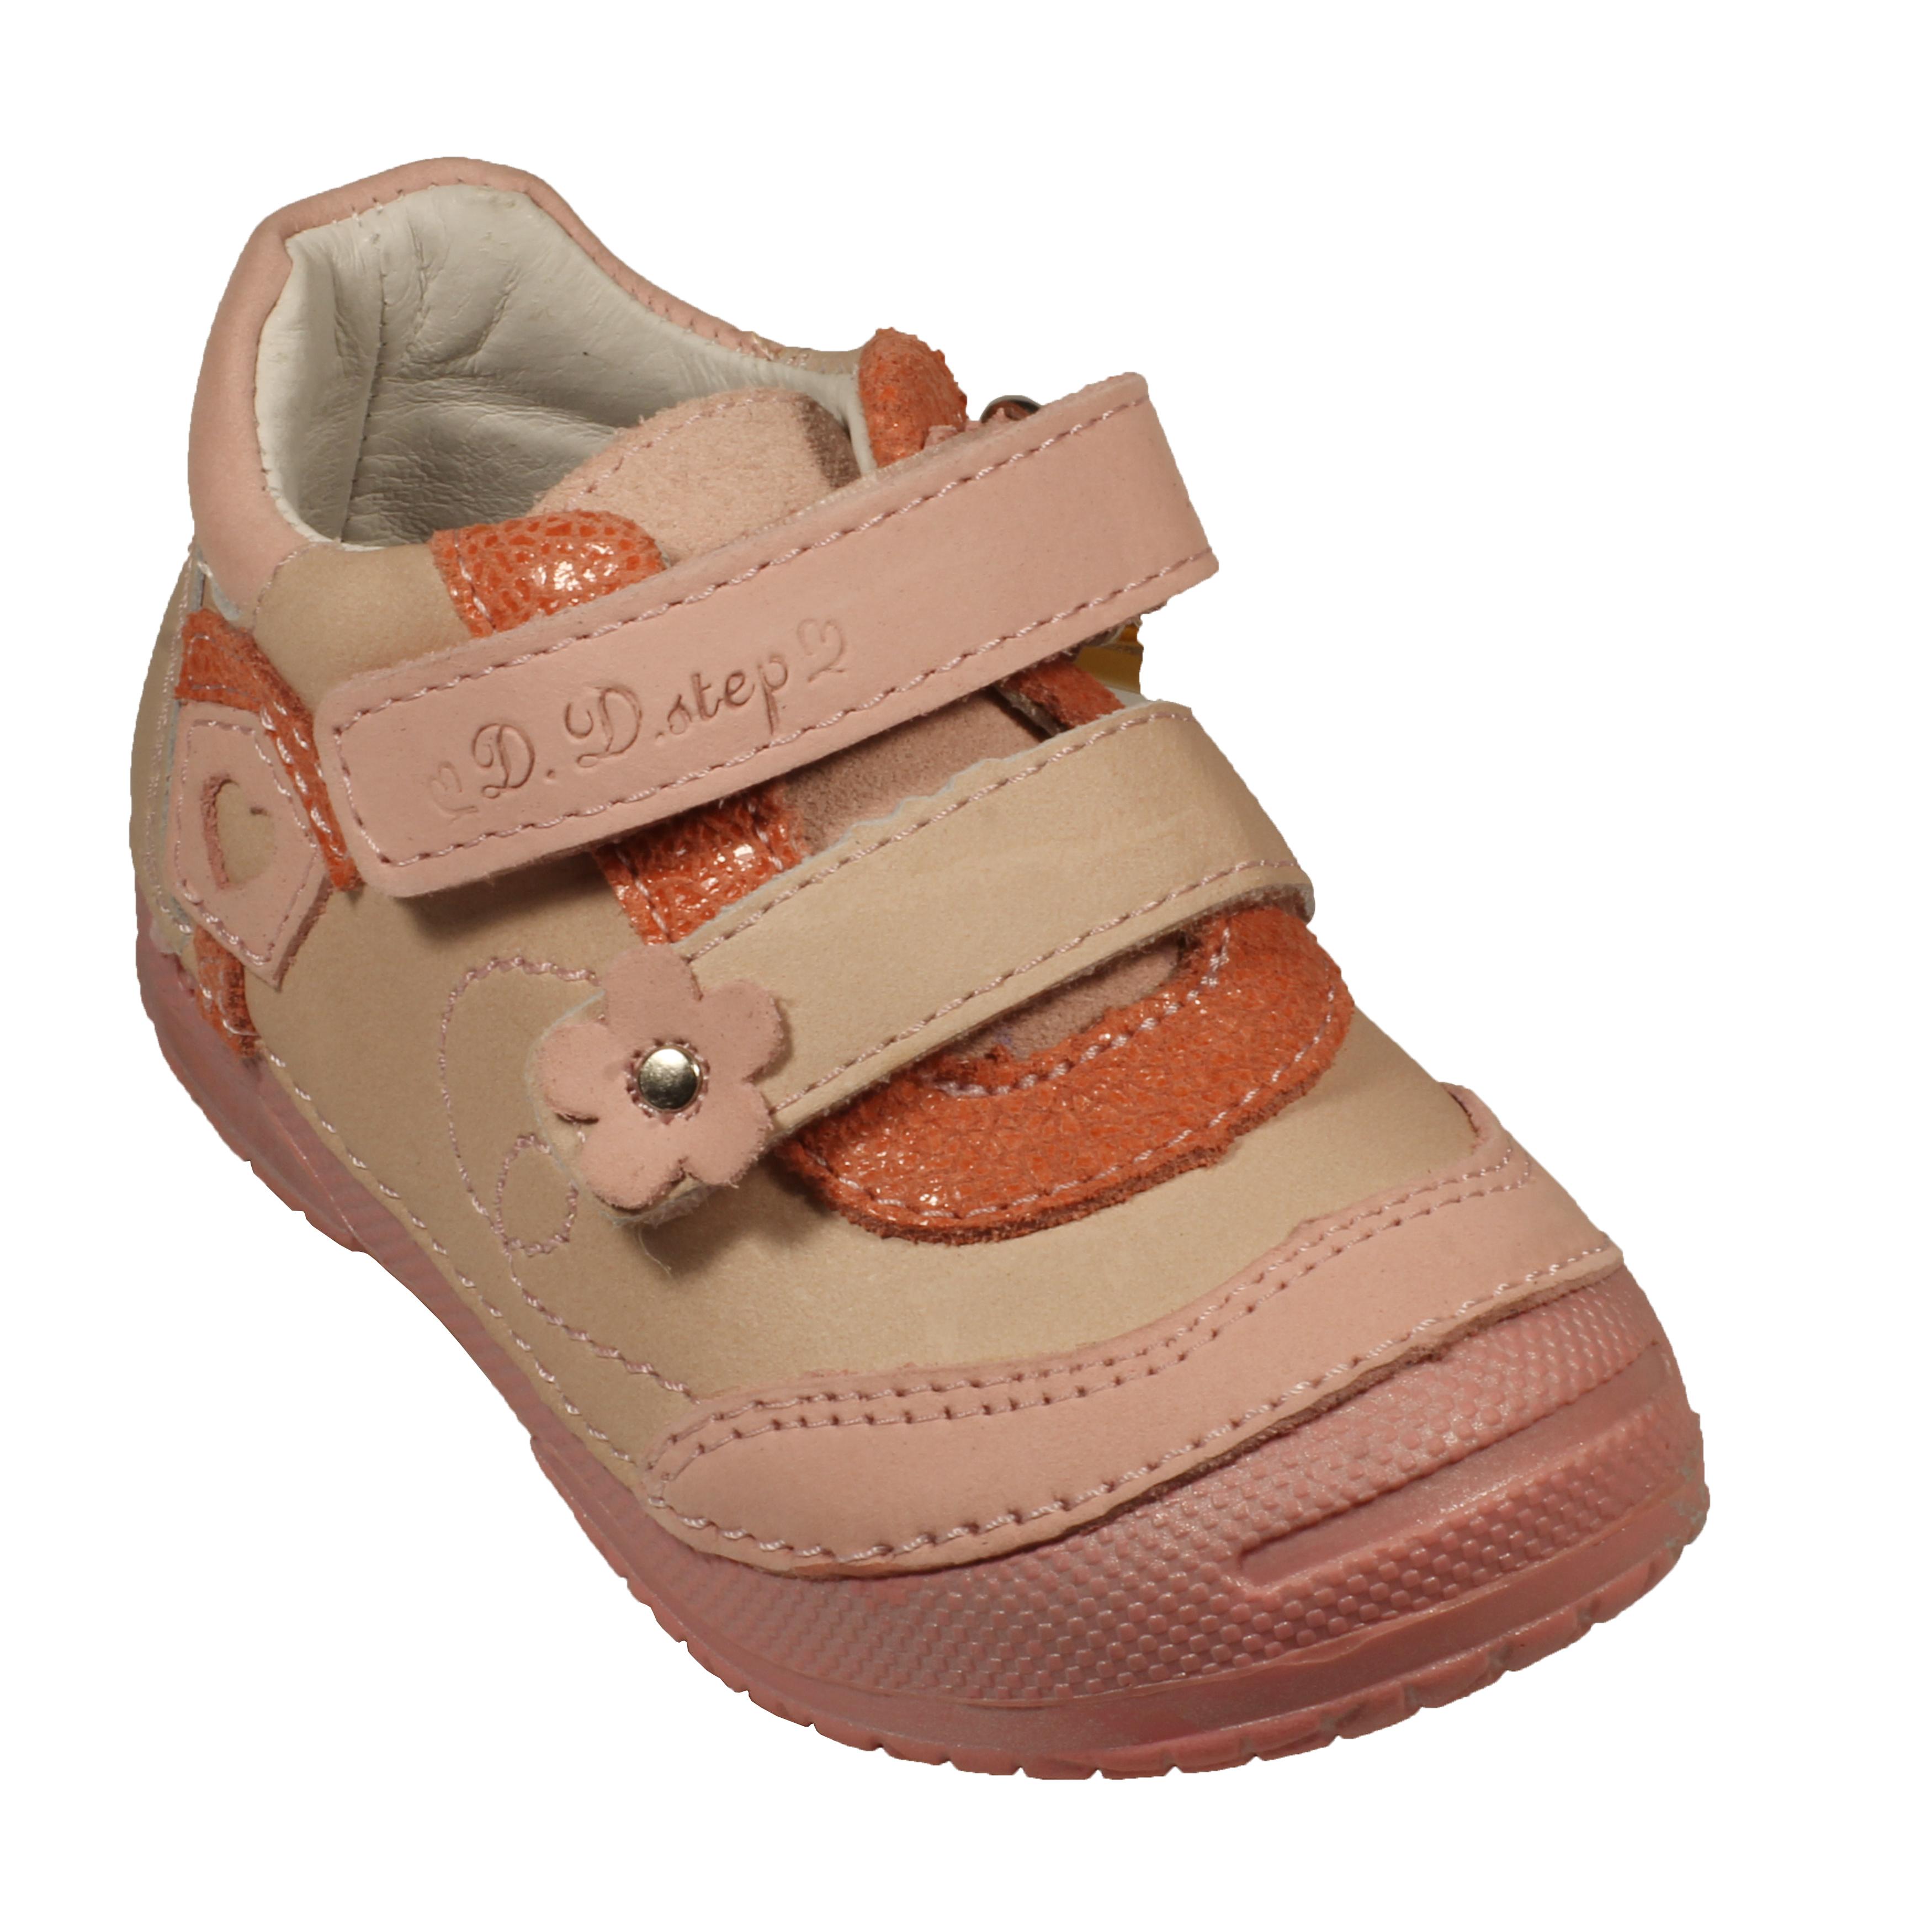 d.d.step lány bőr cipő 038 17B | Jager Shoes